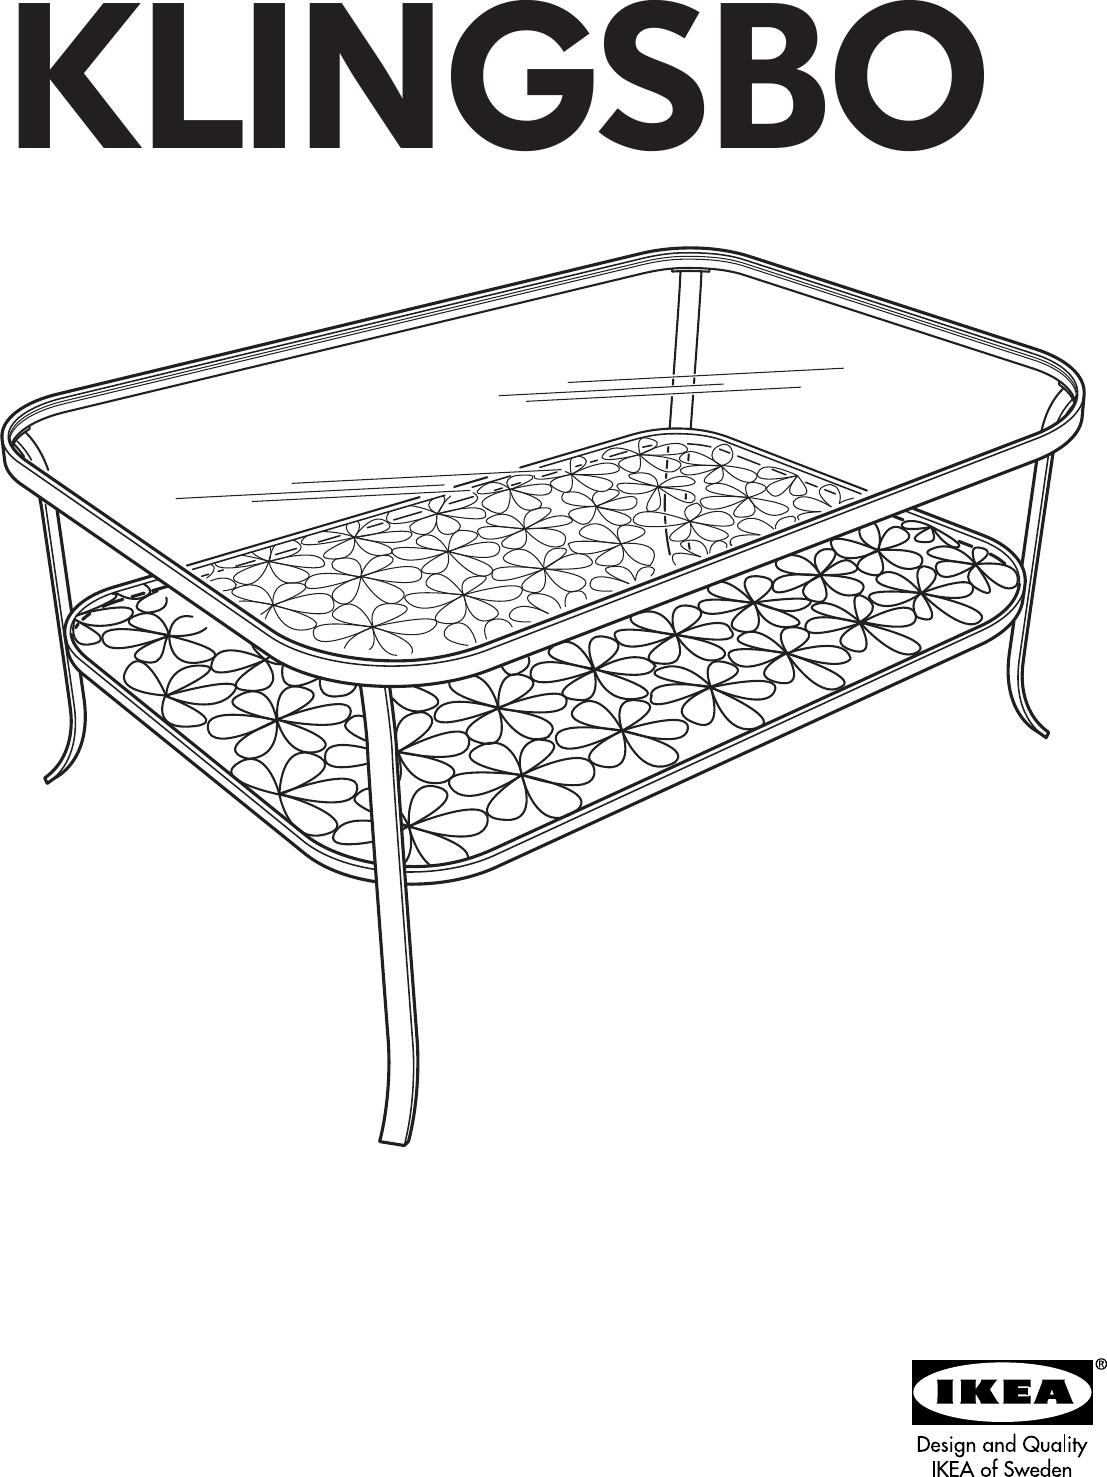 Ikea Klingsbo Coffee Table 45x20 Embly Instruction